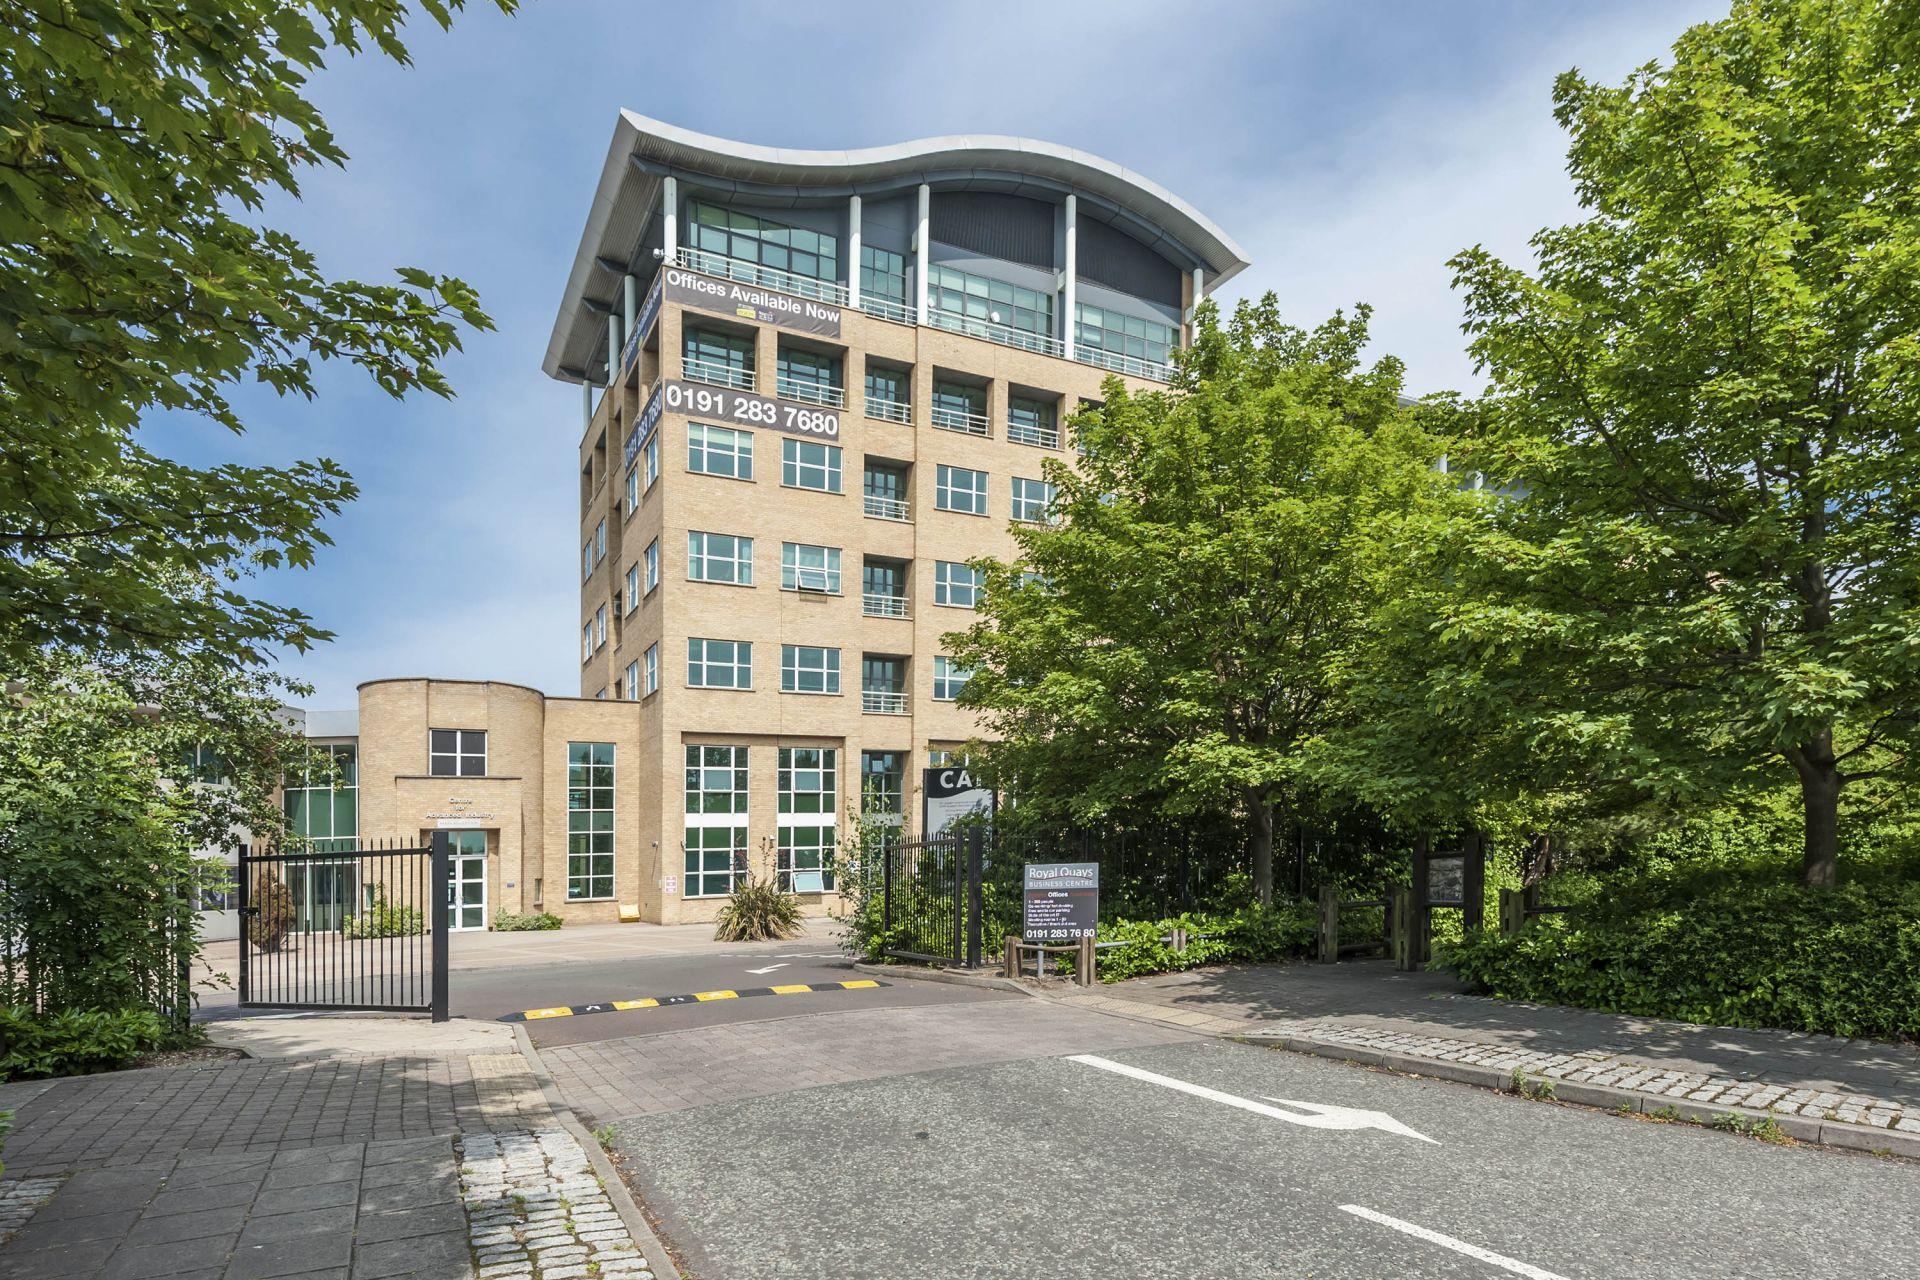 Royal Quays Business Centre, Newcastle Upon Tyne